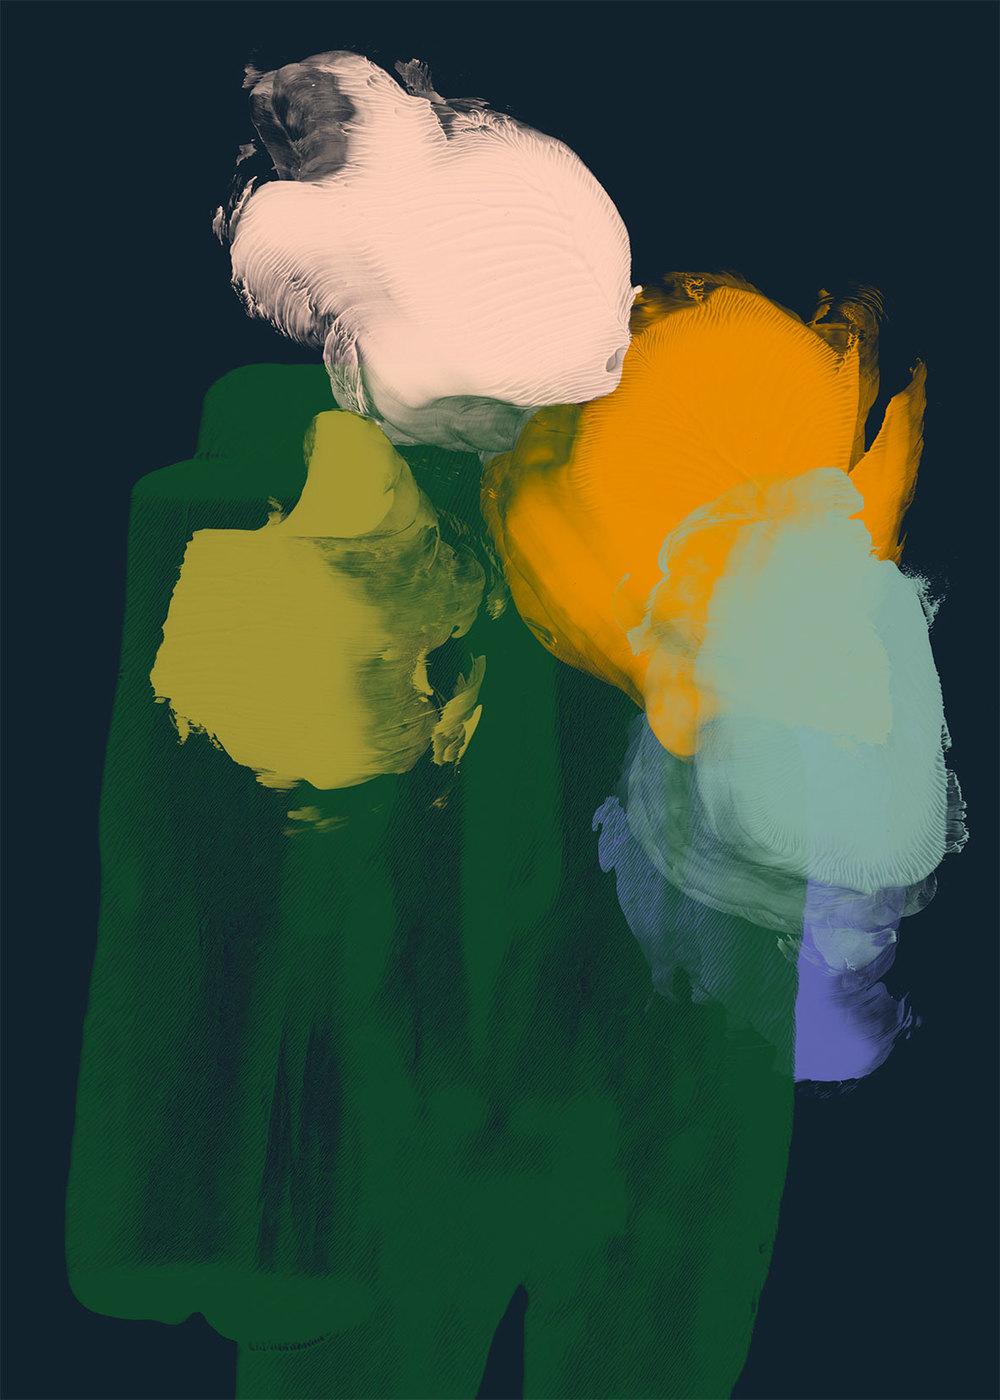 Kukkapuska, 2014, Pigmenttiprintti paperille, 100 x 70 cm. /Flower Bunch, 2014, Pigmentprint on paper, 100 x 70 cm. © Reeta Ek